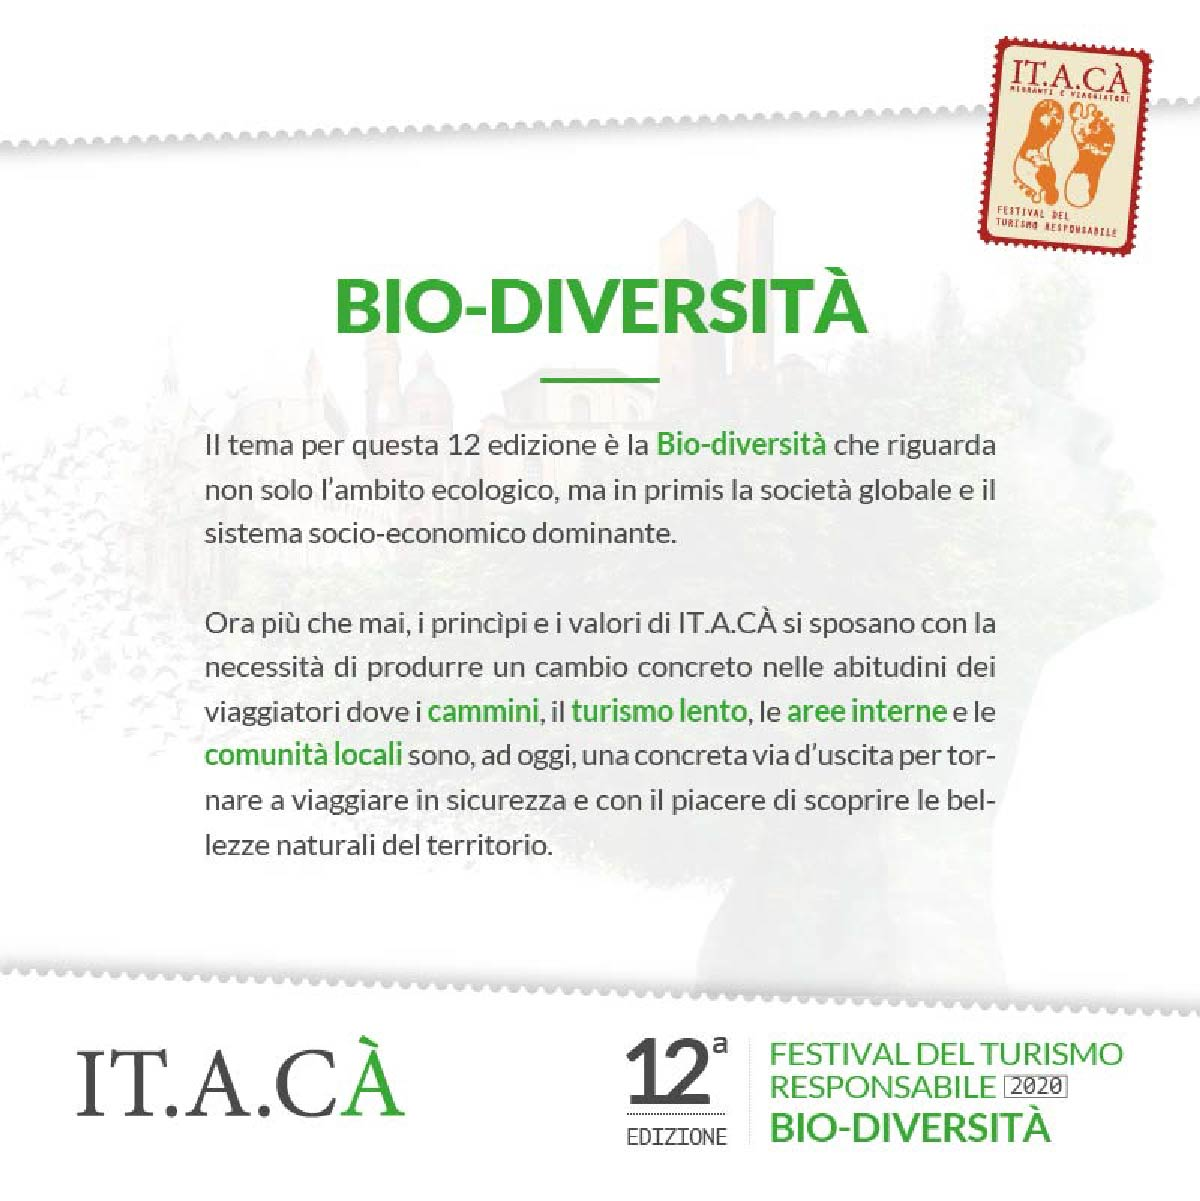 festival-itaca-strategia-eventi-turismo-sostenibile-branding-5